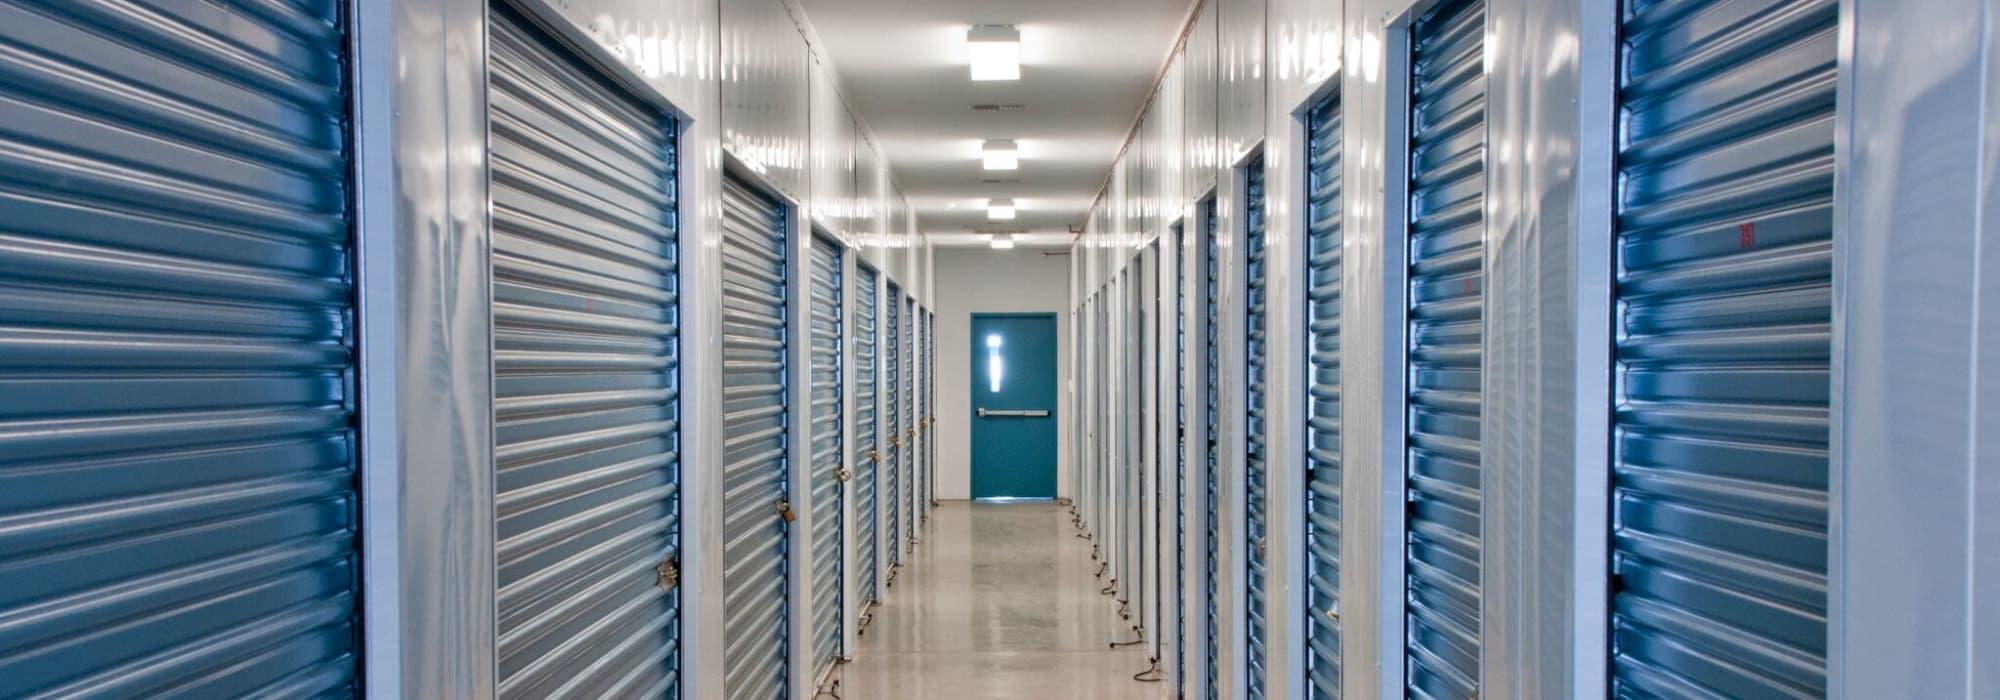 Self storage units in High Point North Carolina